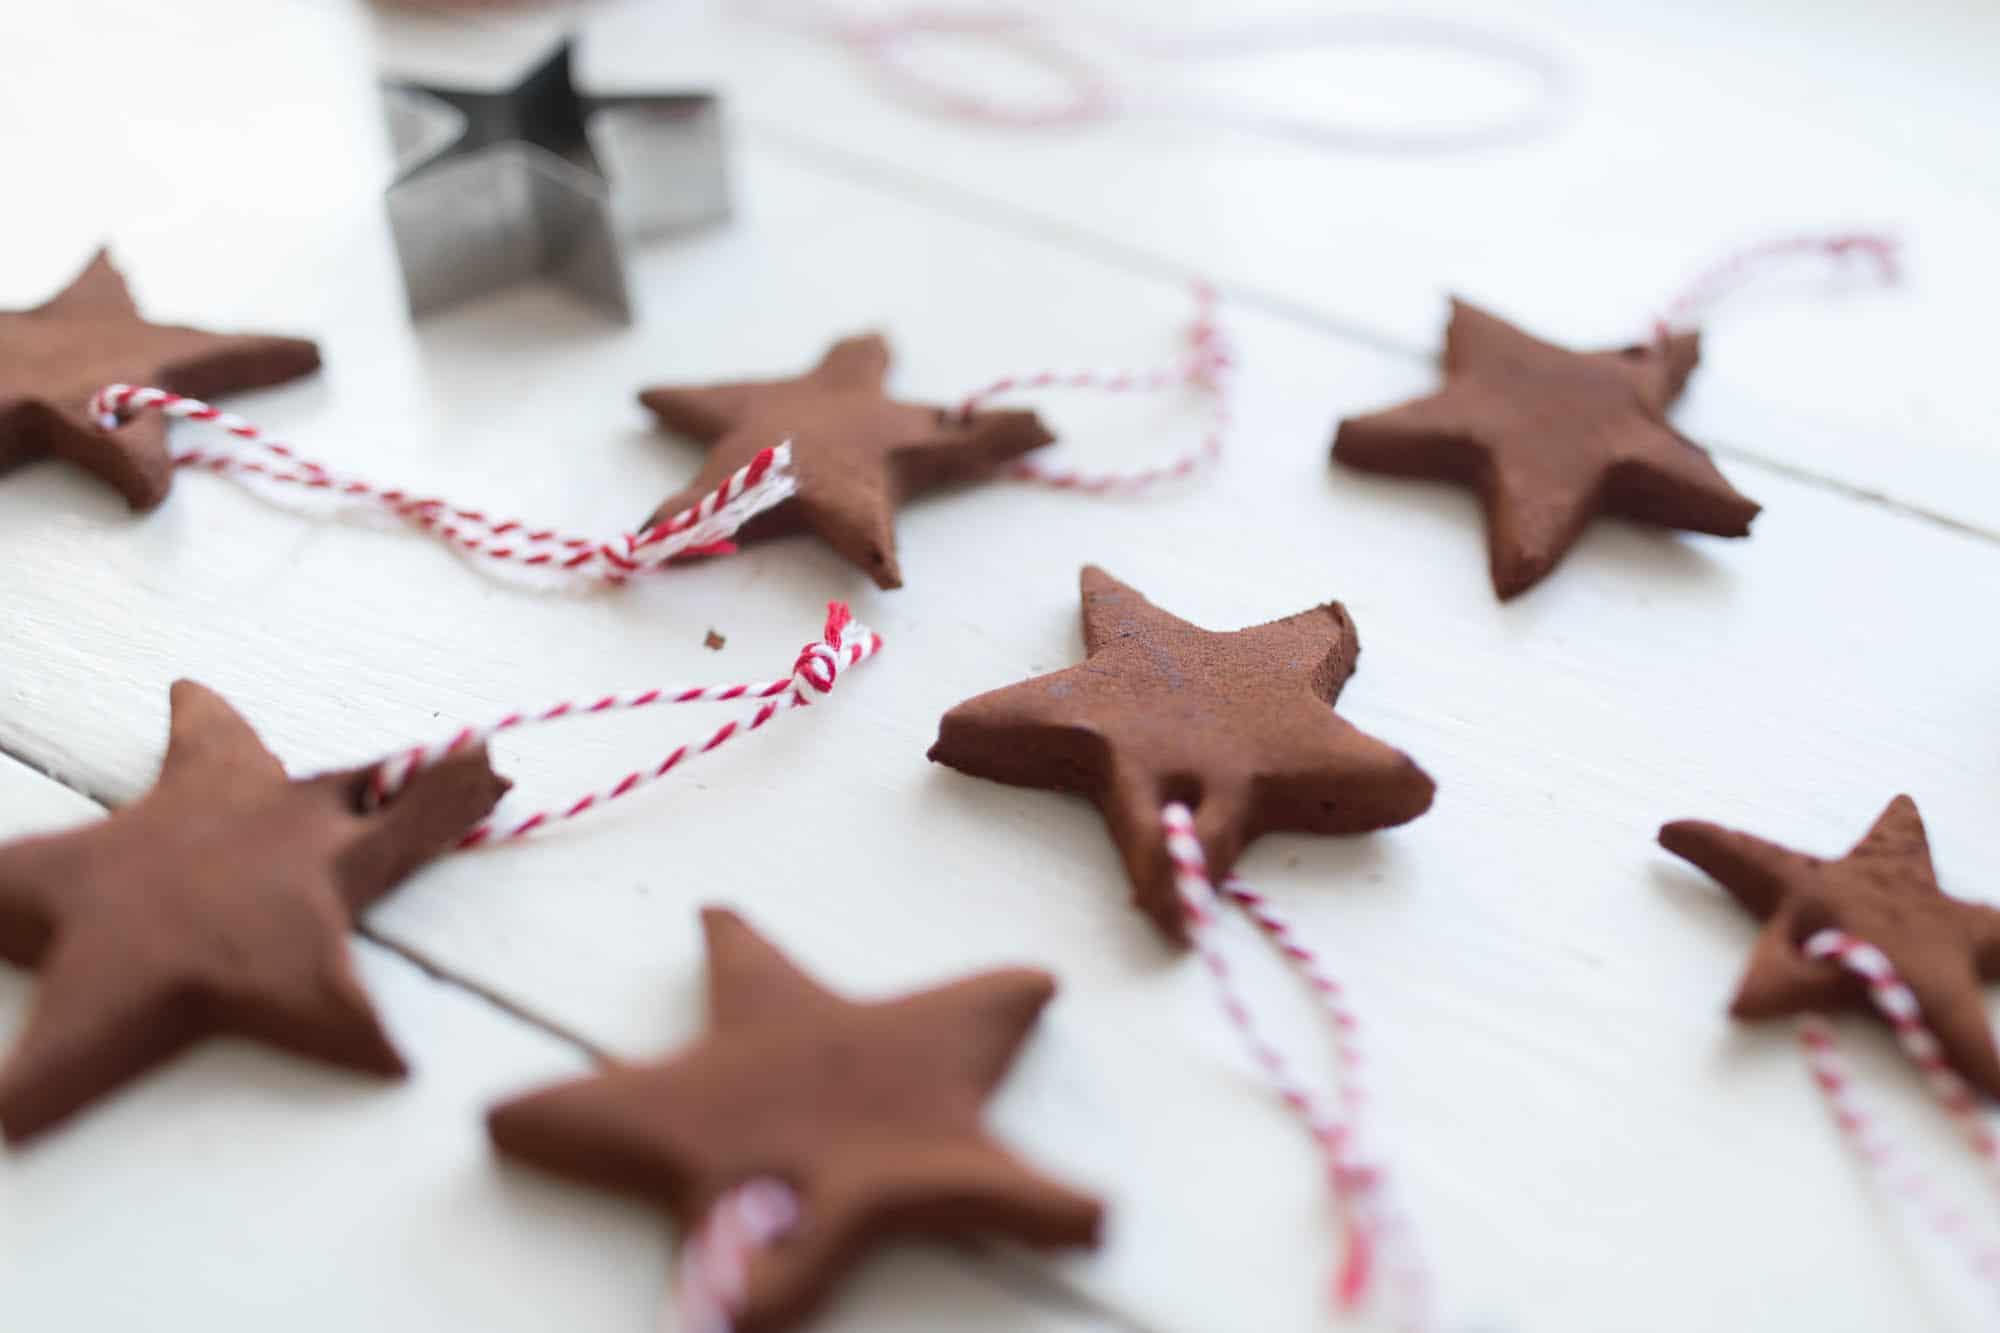 DIY Applesauce Cinnamon Ornaments Video Tutorial Great for Kids